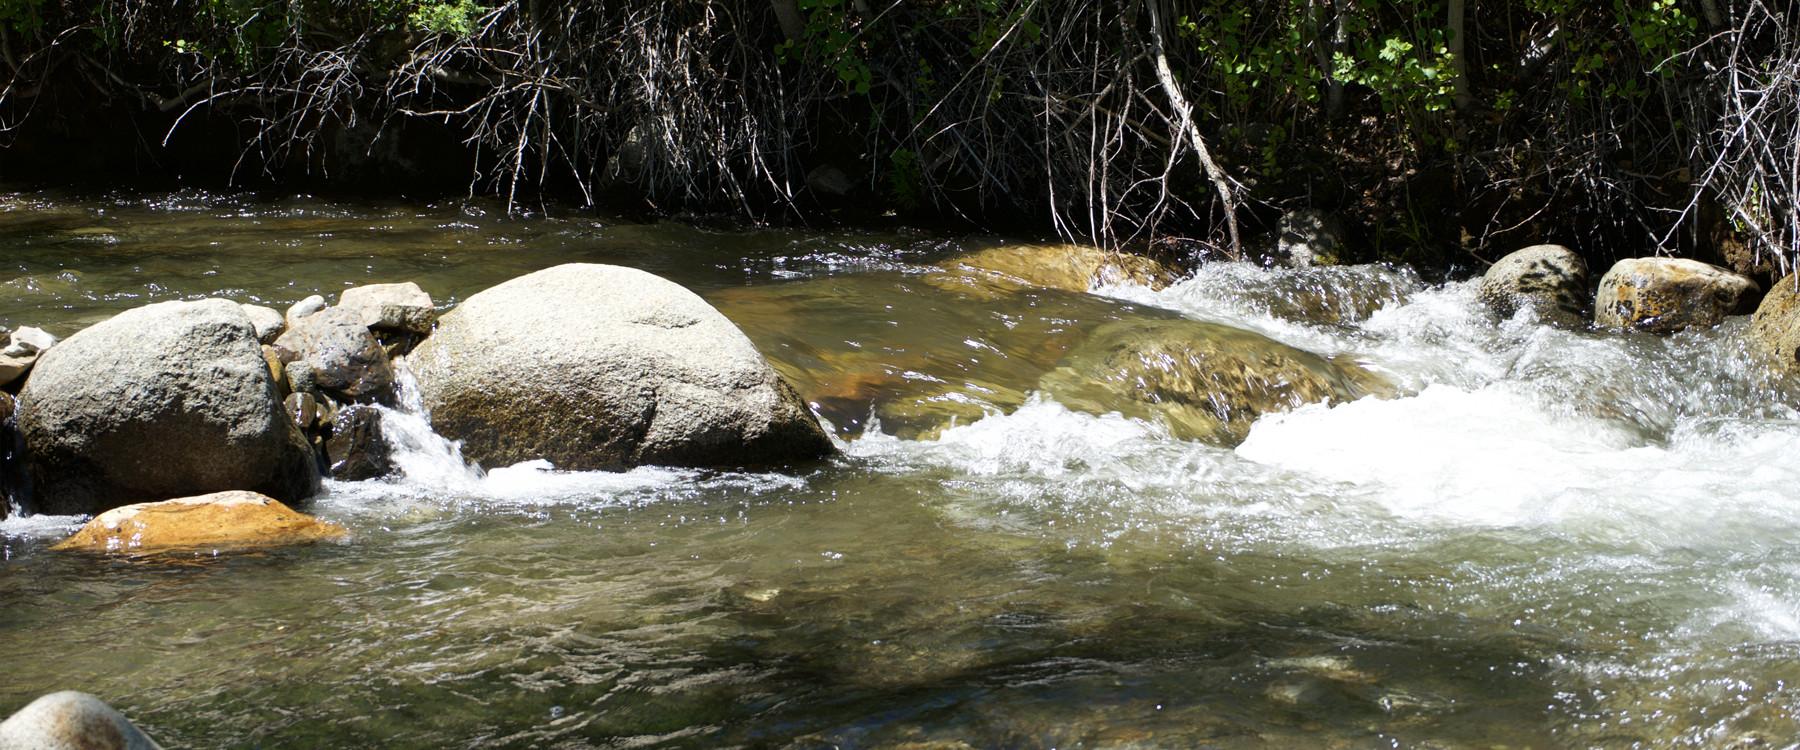 Mcgee Creek Rv Park Amp Campground Mcgee Creek Rv Campground